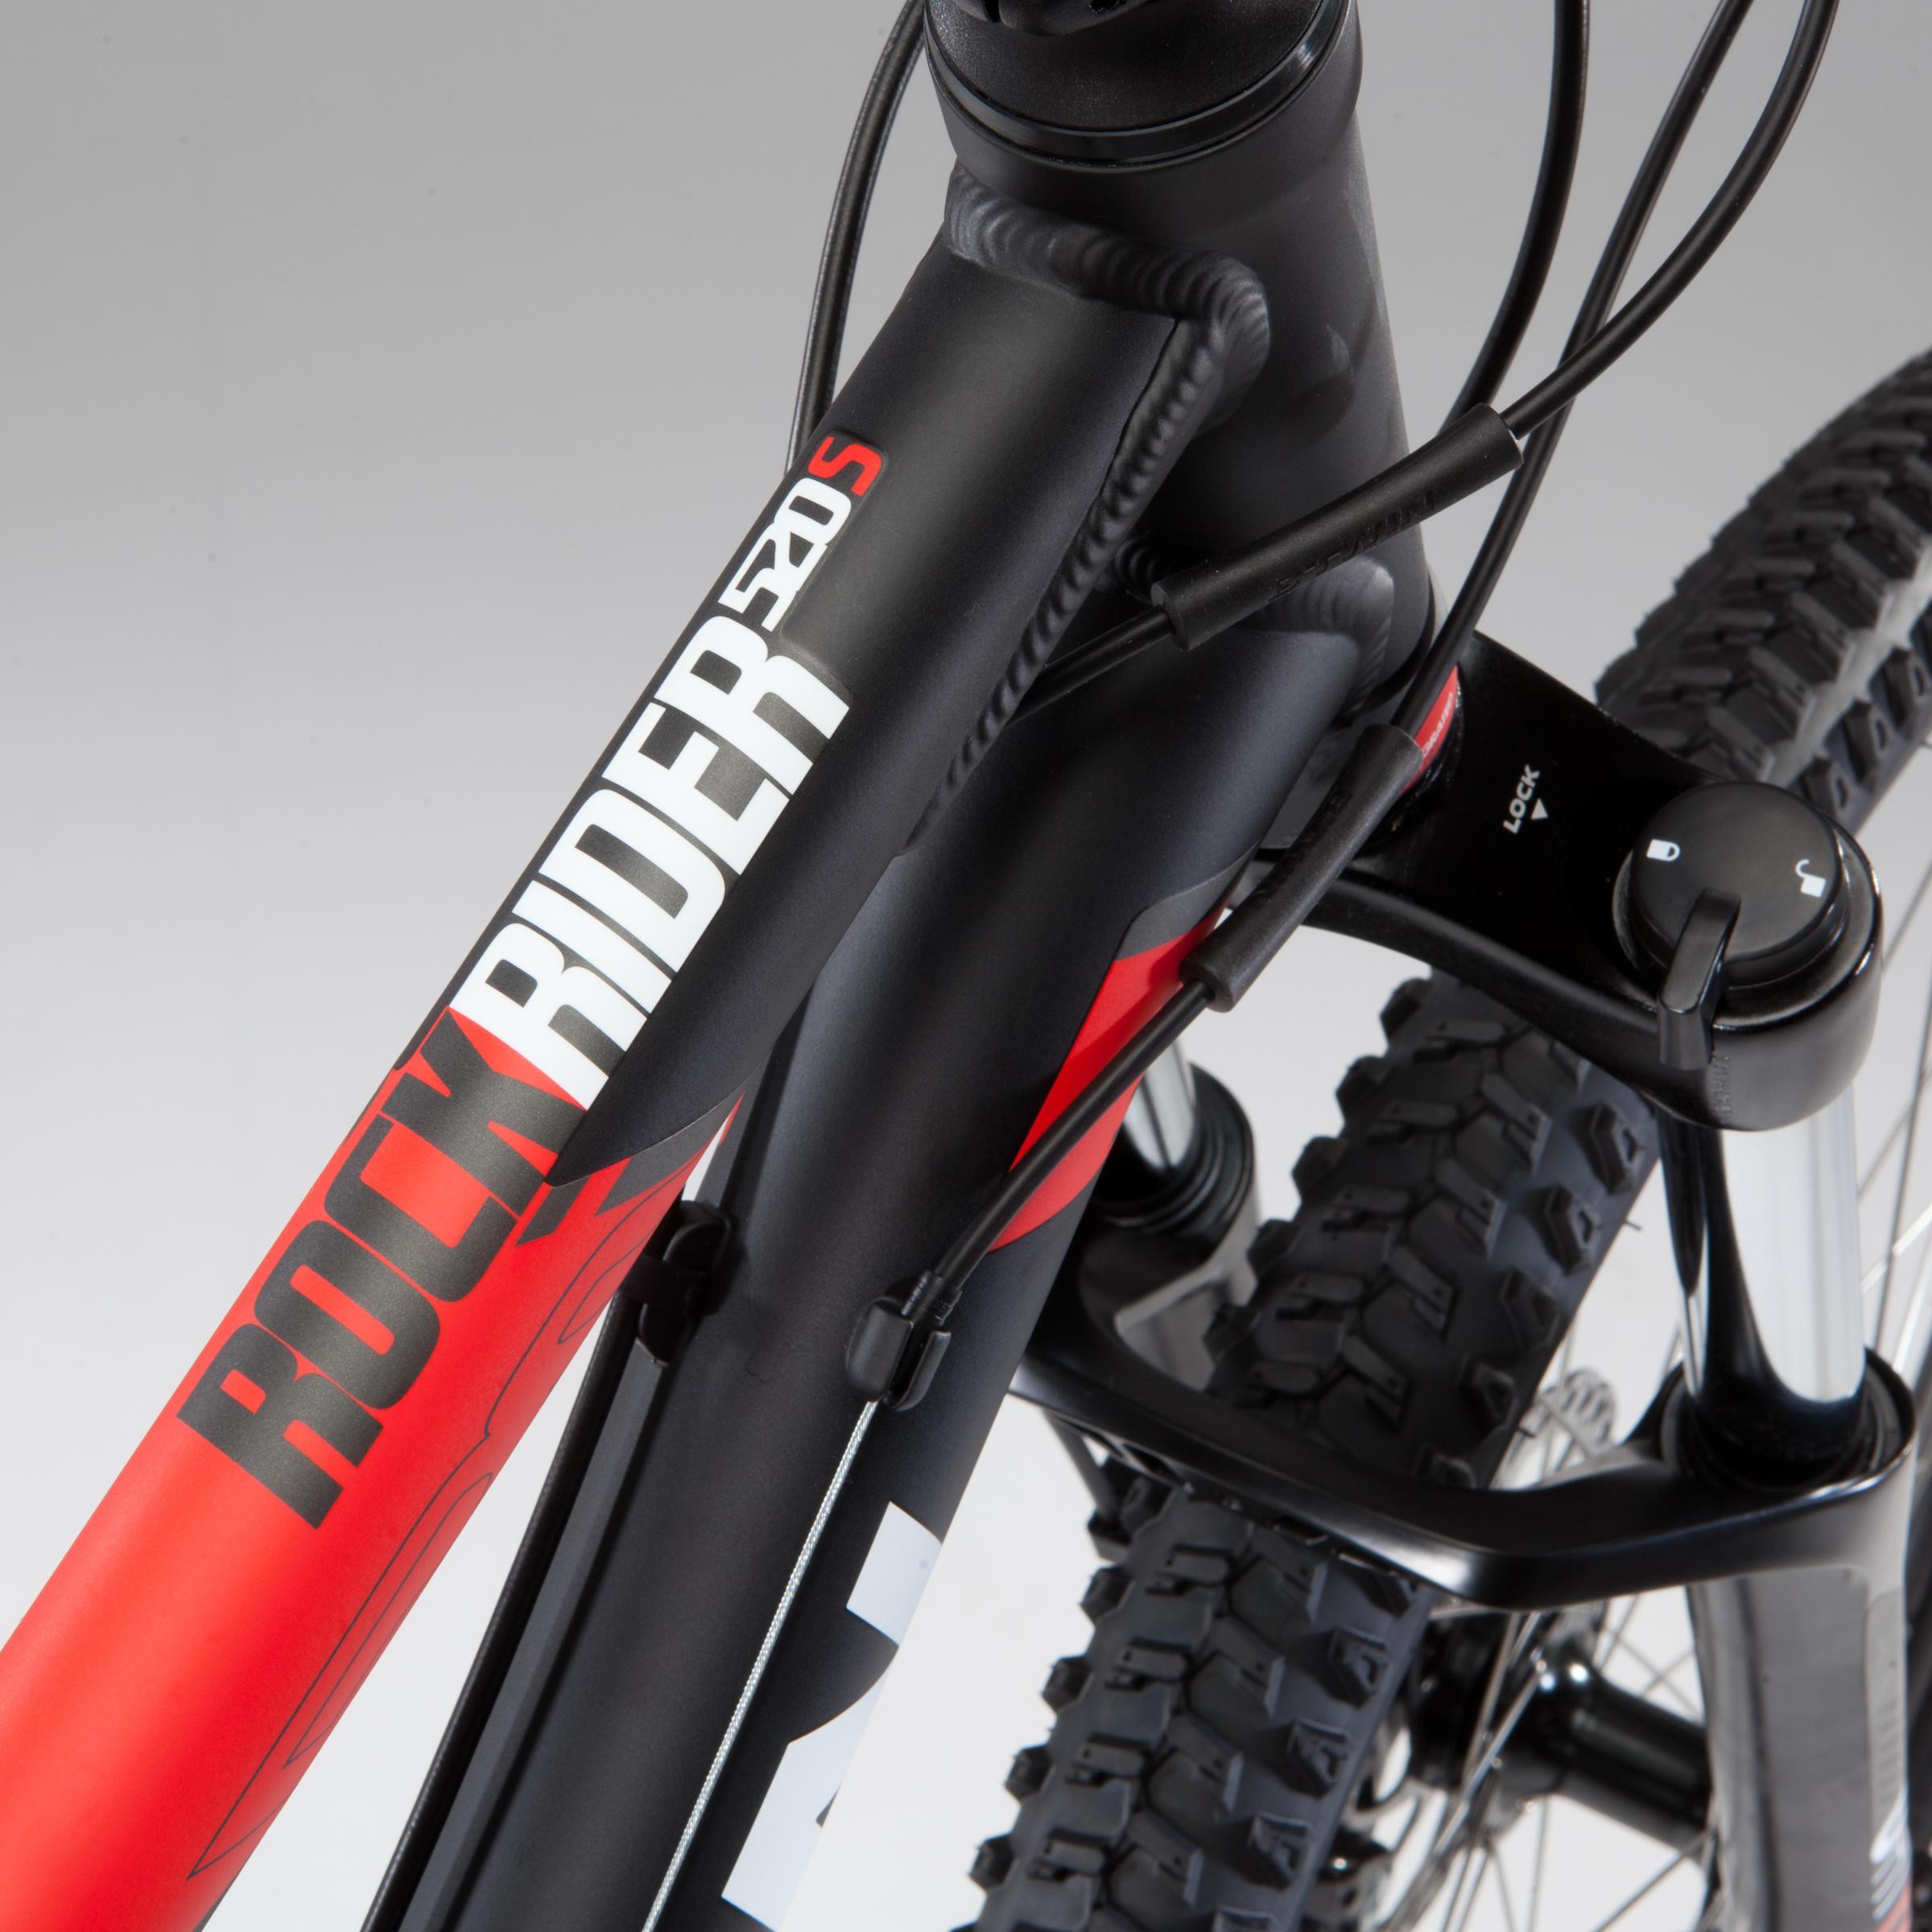 ST 520 S Mountain Bike 27.5_QUOTE_ - Grey